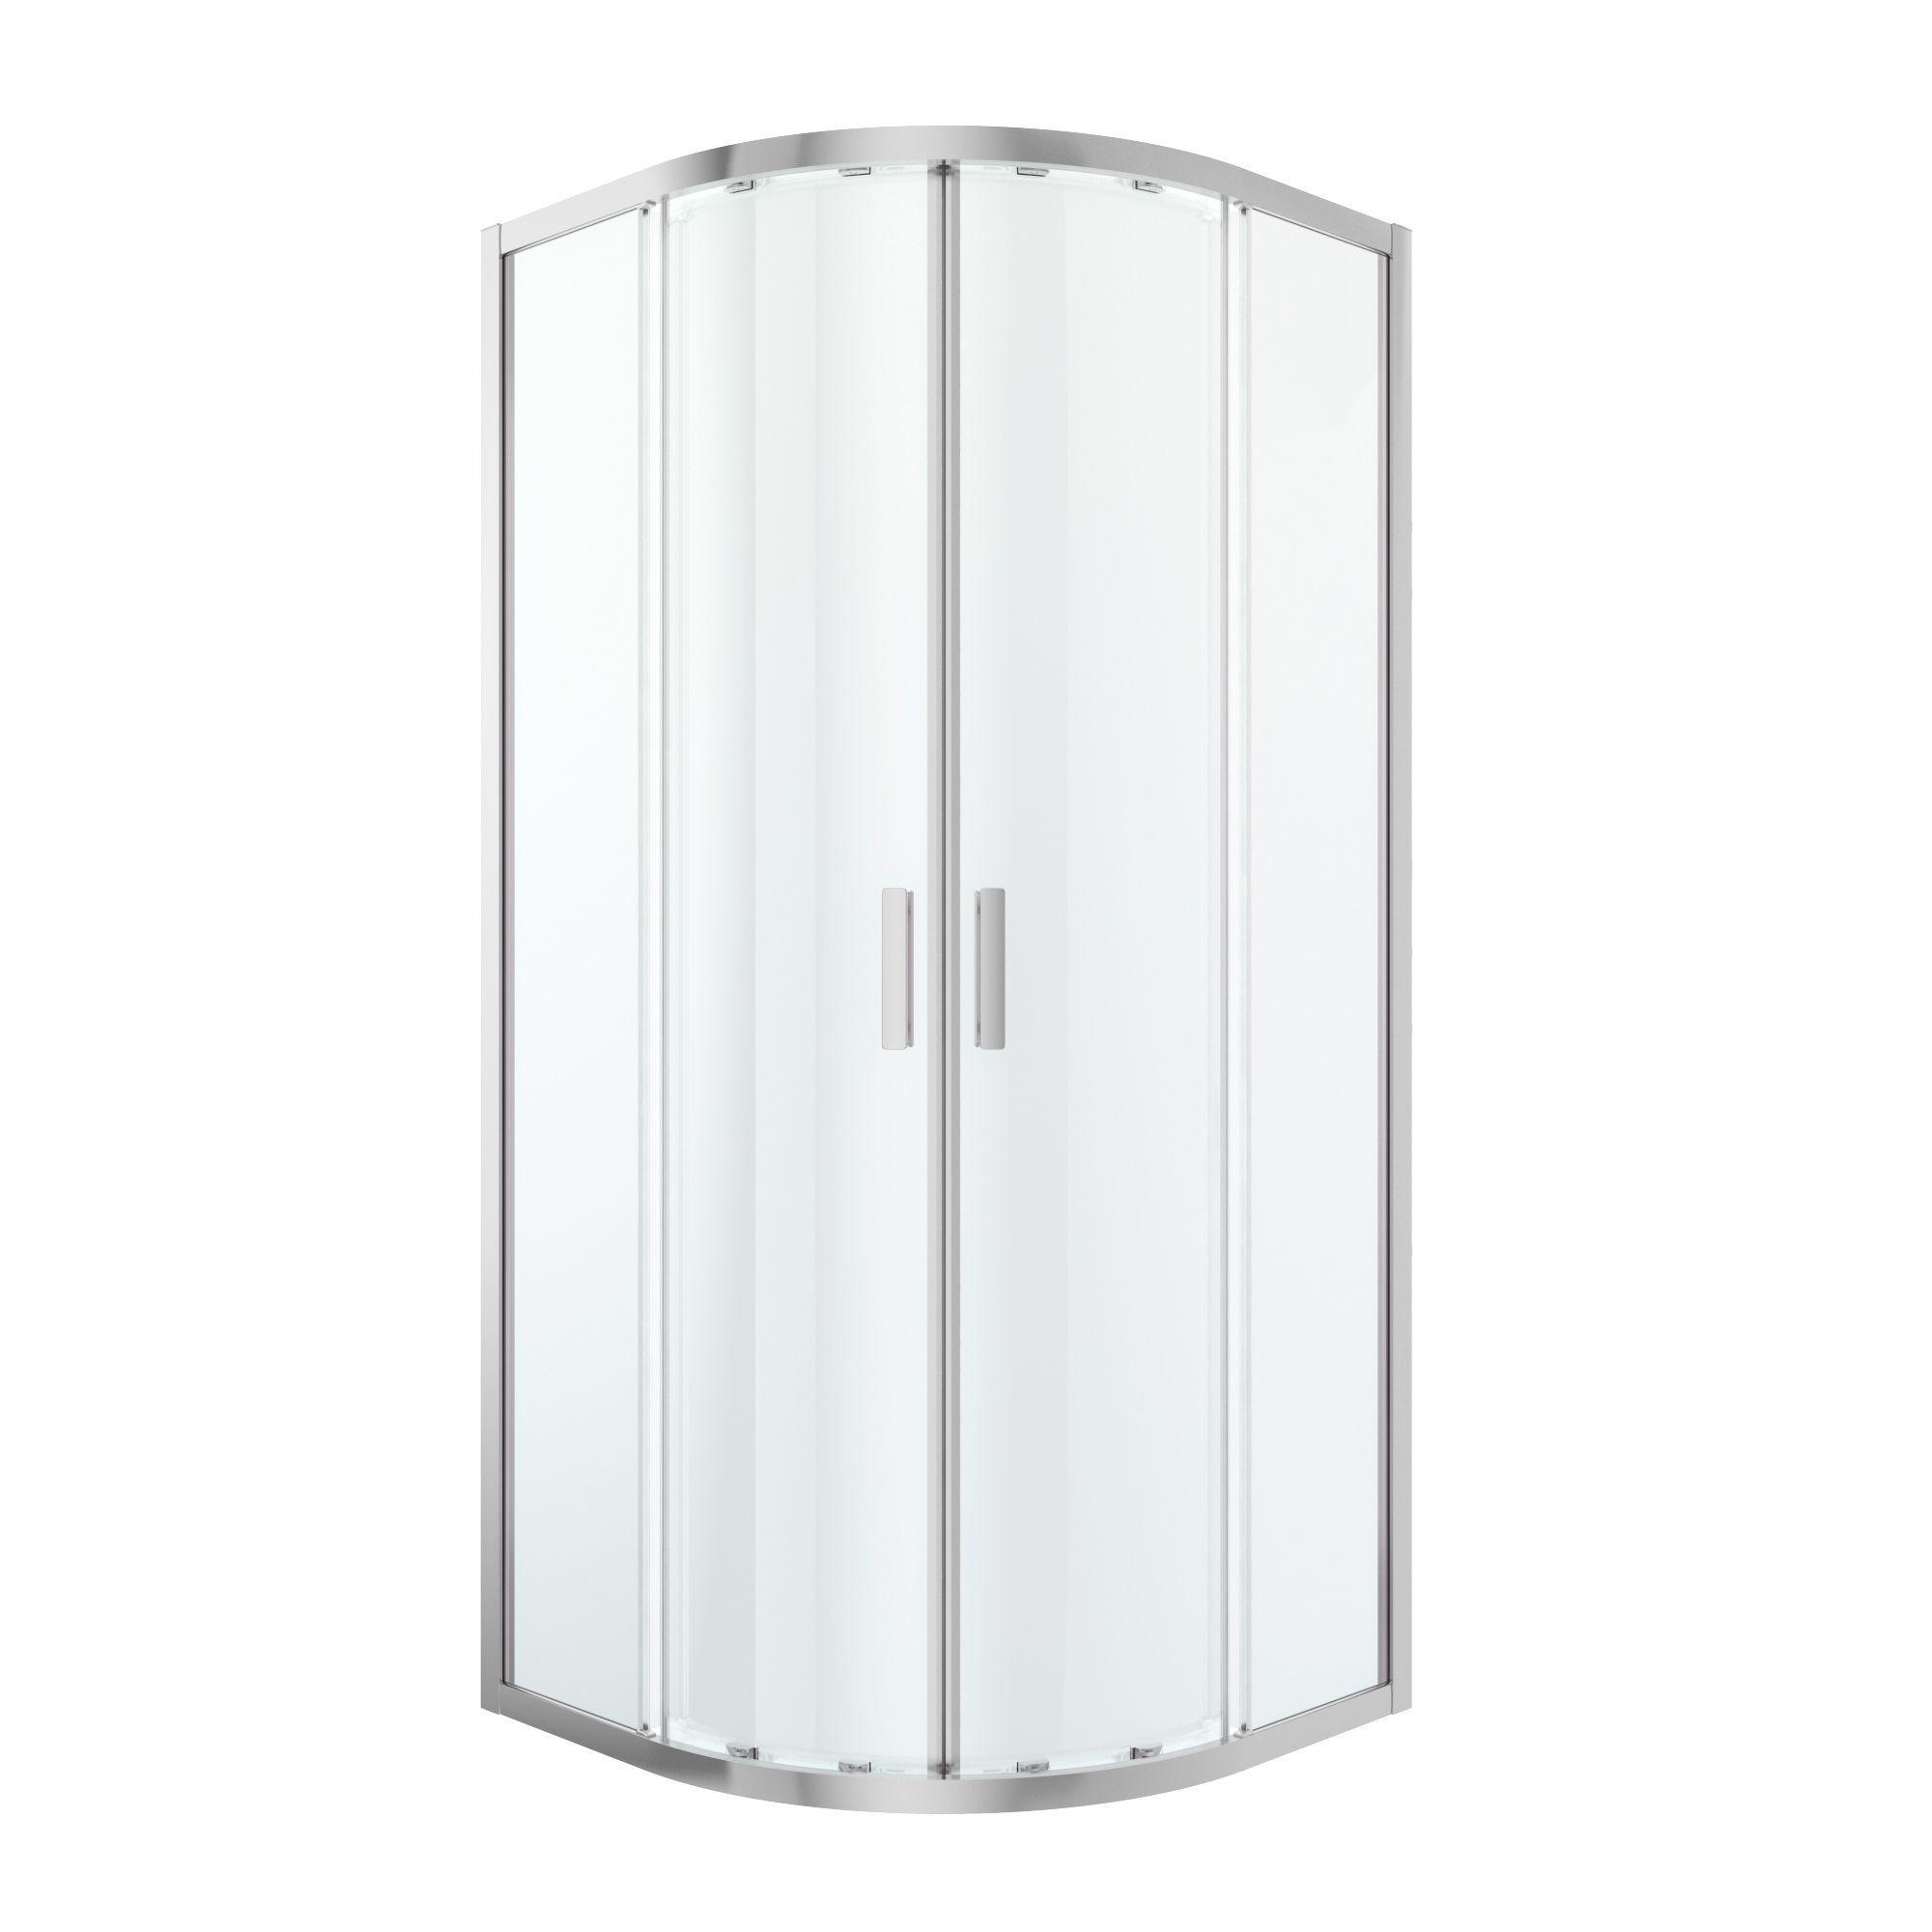 Cooke & Lewis Beloya Quadrant Shower Enclosure With Corner Entry Double Sliding Door (w)900mm (d)900mm